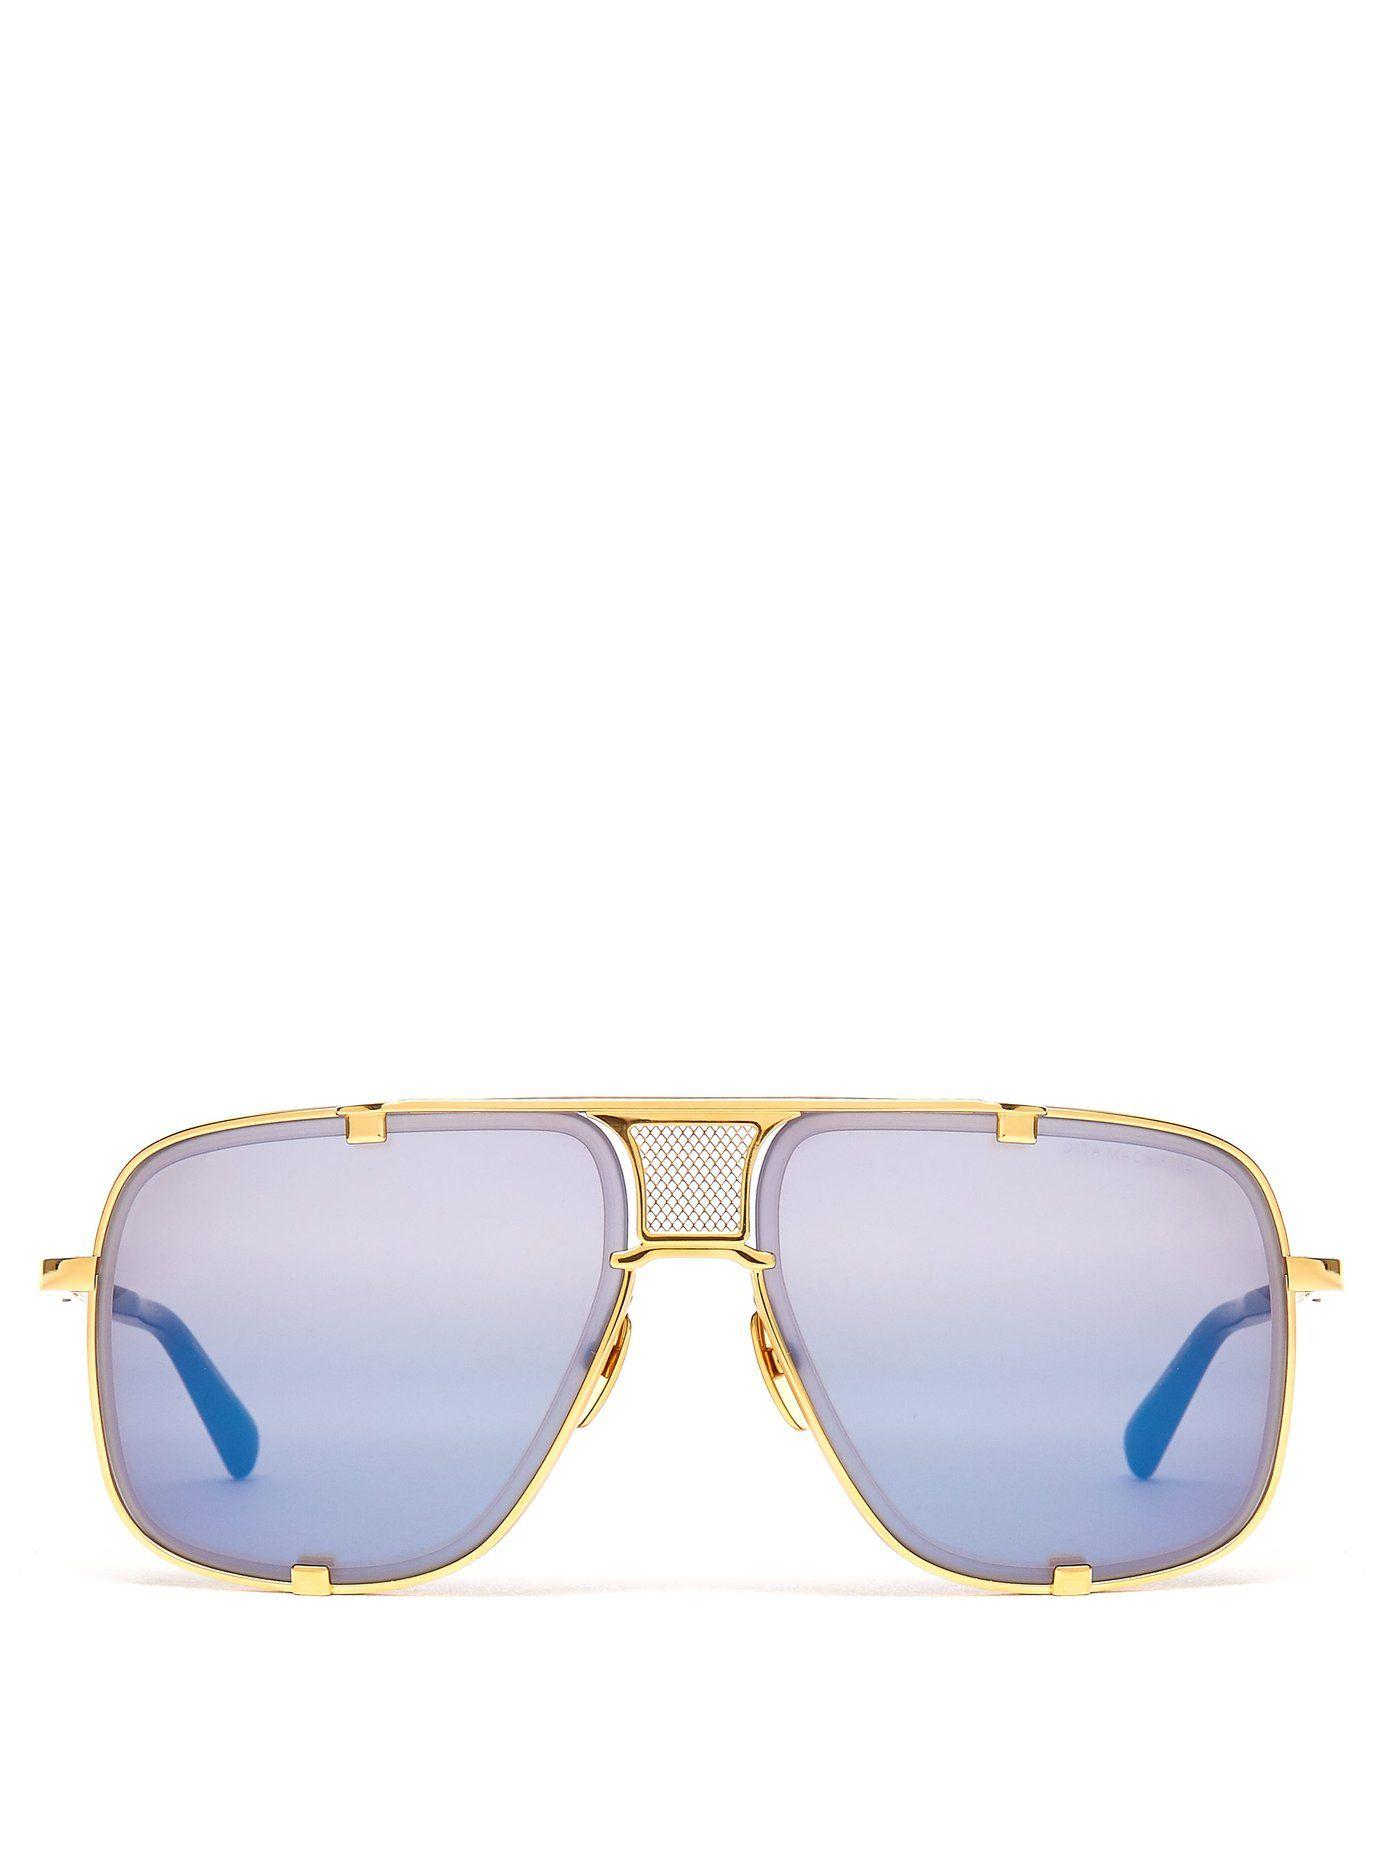 54d0499cd74 DITA Mach-Five metal sunglasses